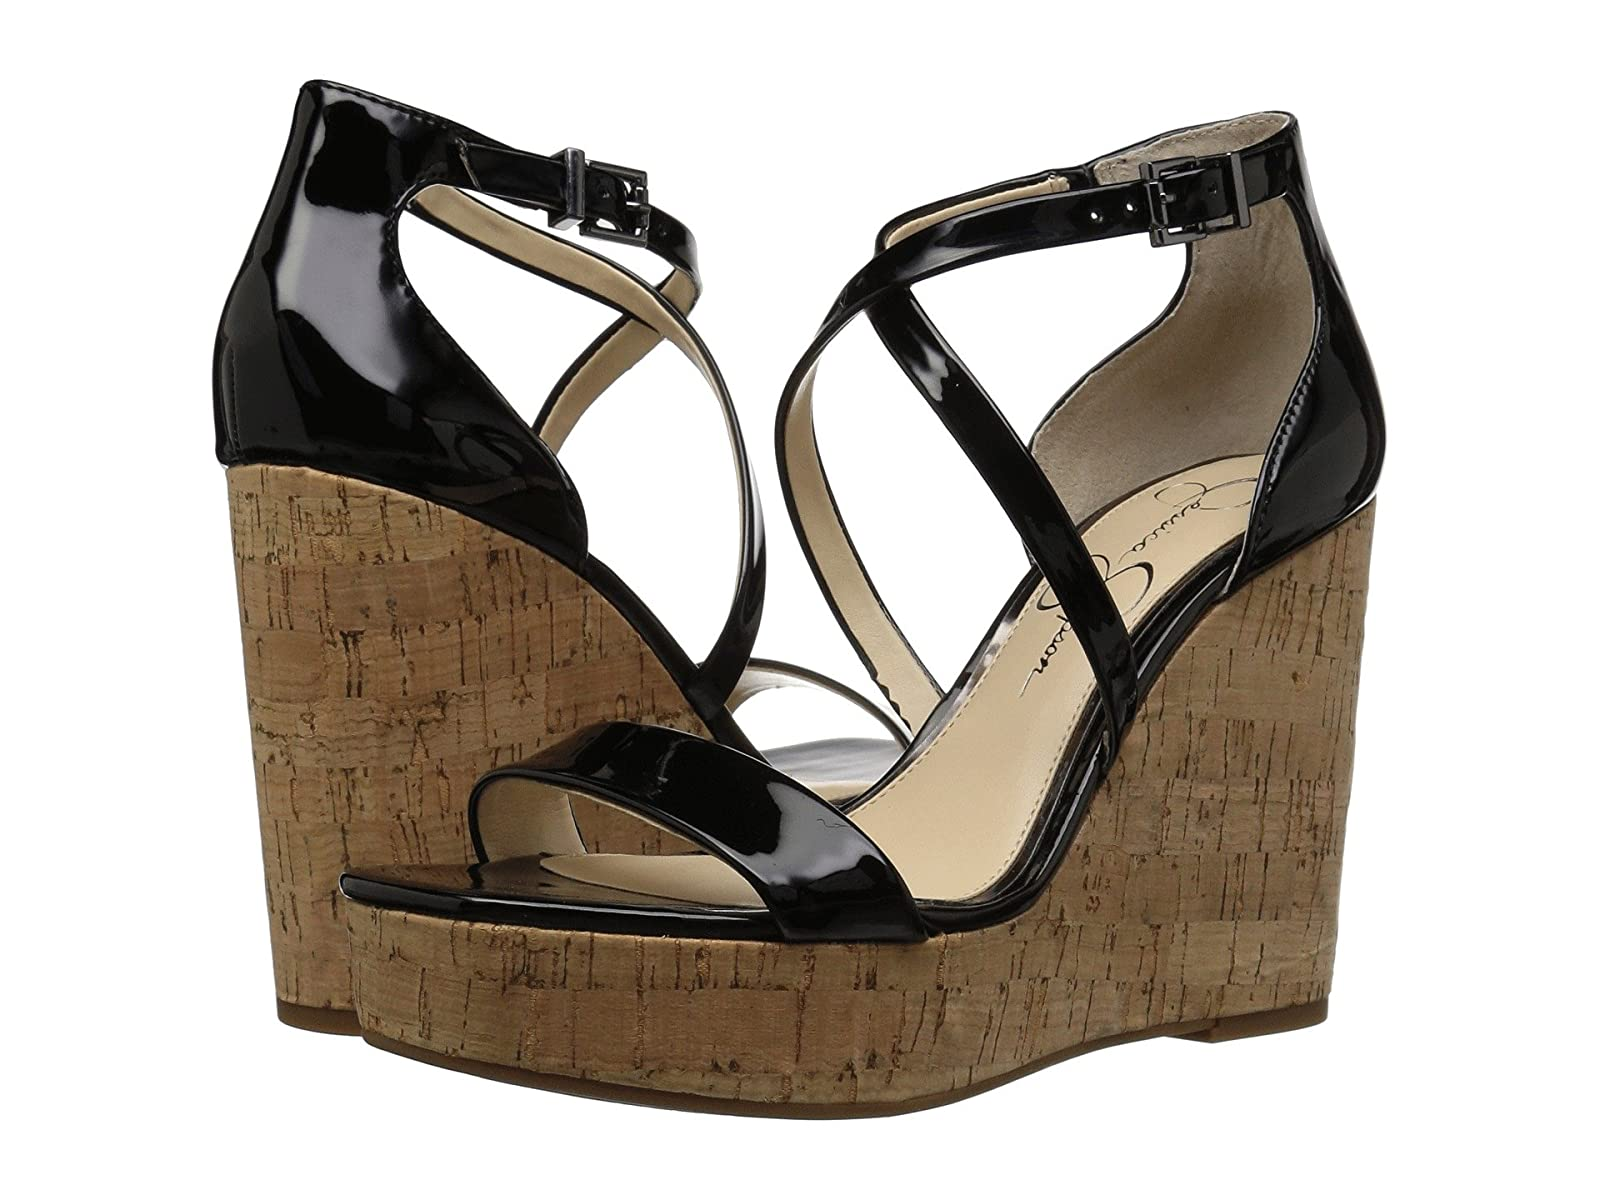 Jessica Simpson StassiAtmospheric grades have affordable shoes